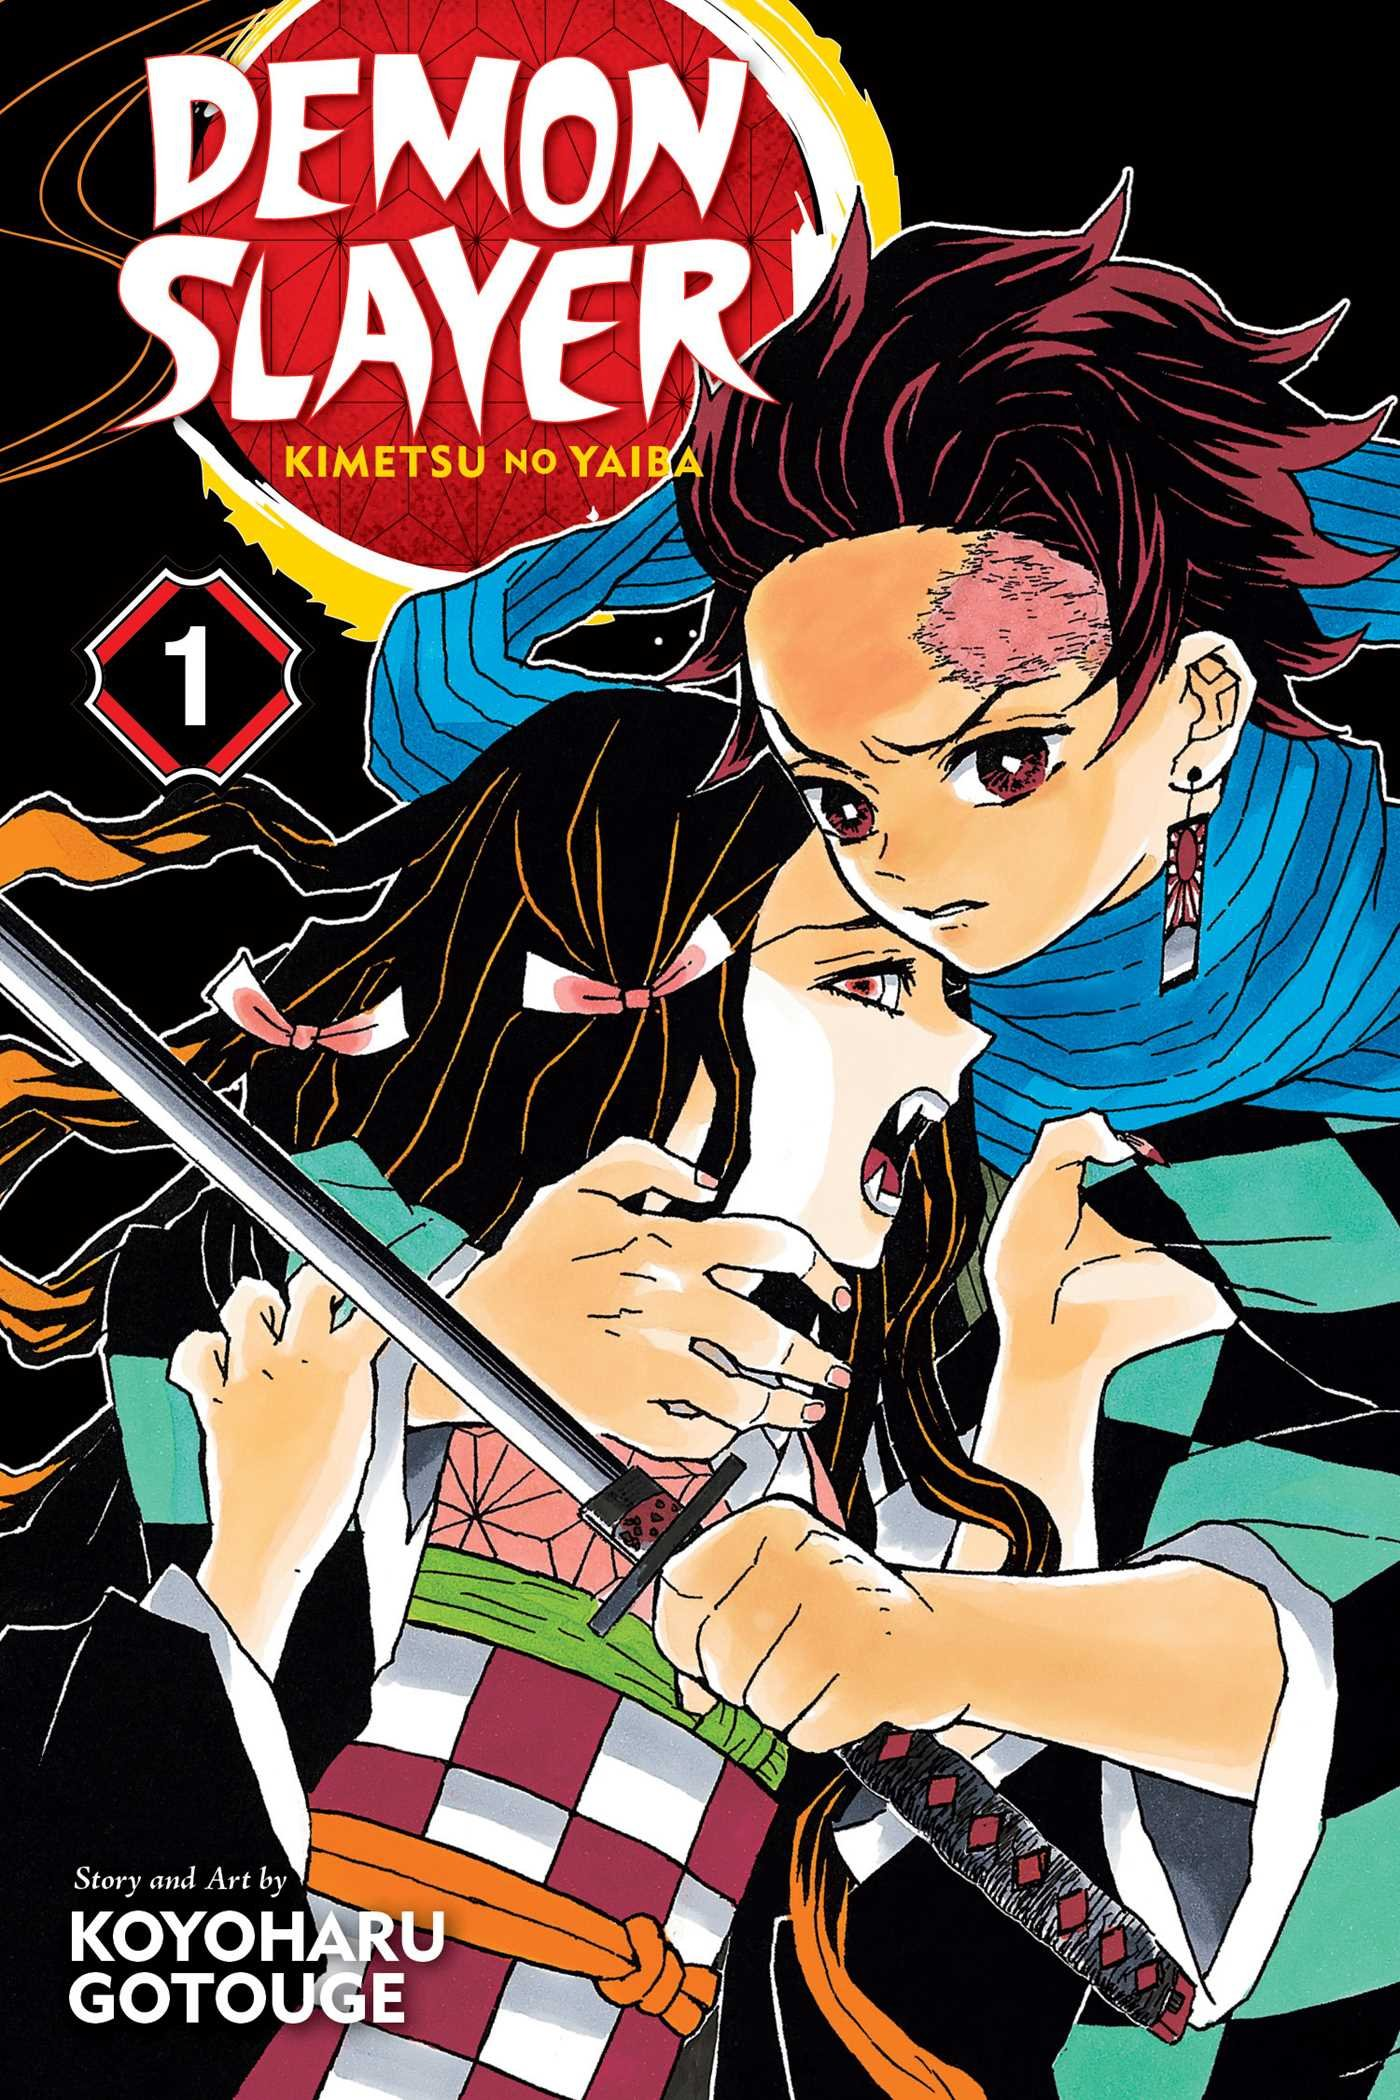 Kimetsu no Yaiba Demon Slayer Blu-ray Disc First Limited Edition vol.1-4 Set